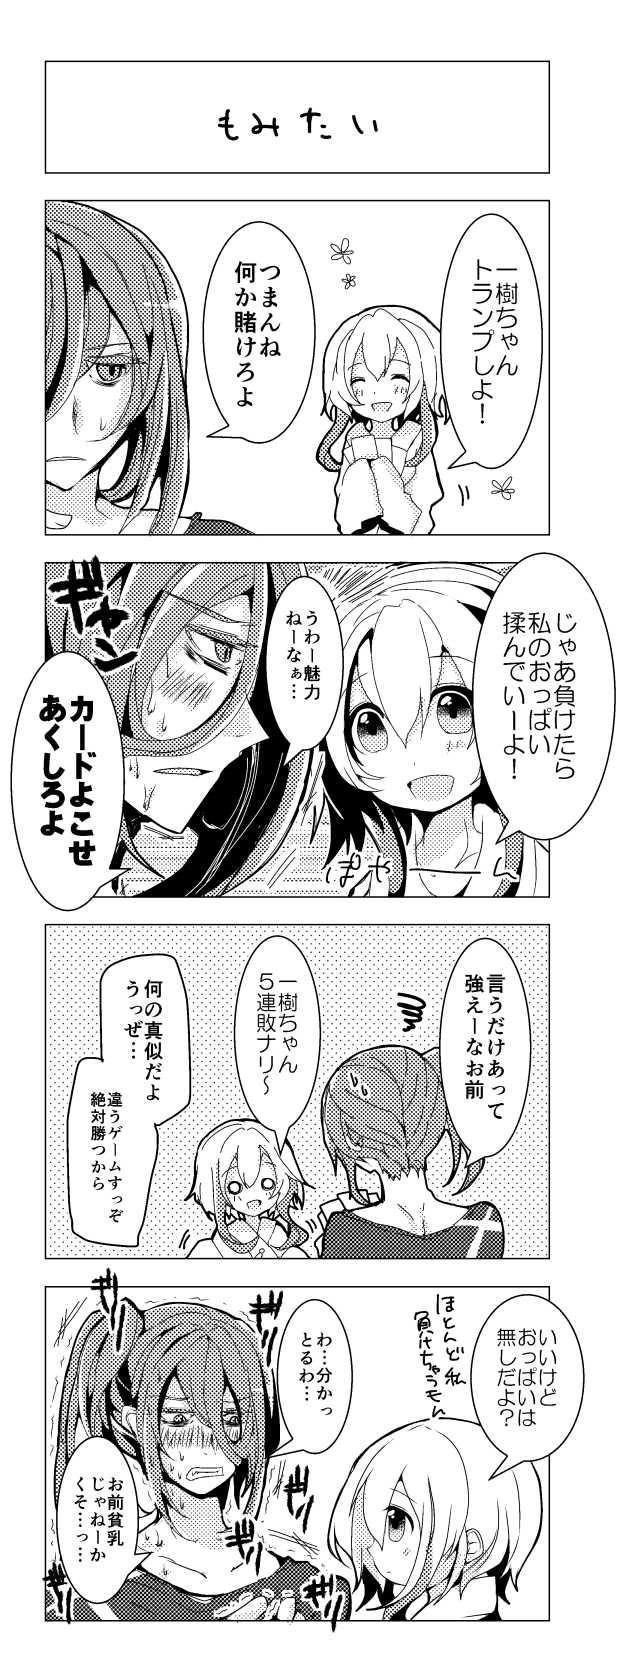 【創作漫画】Unidentified 番外編